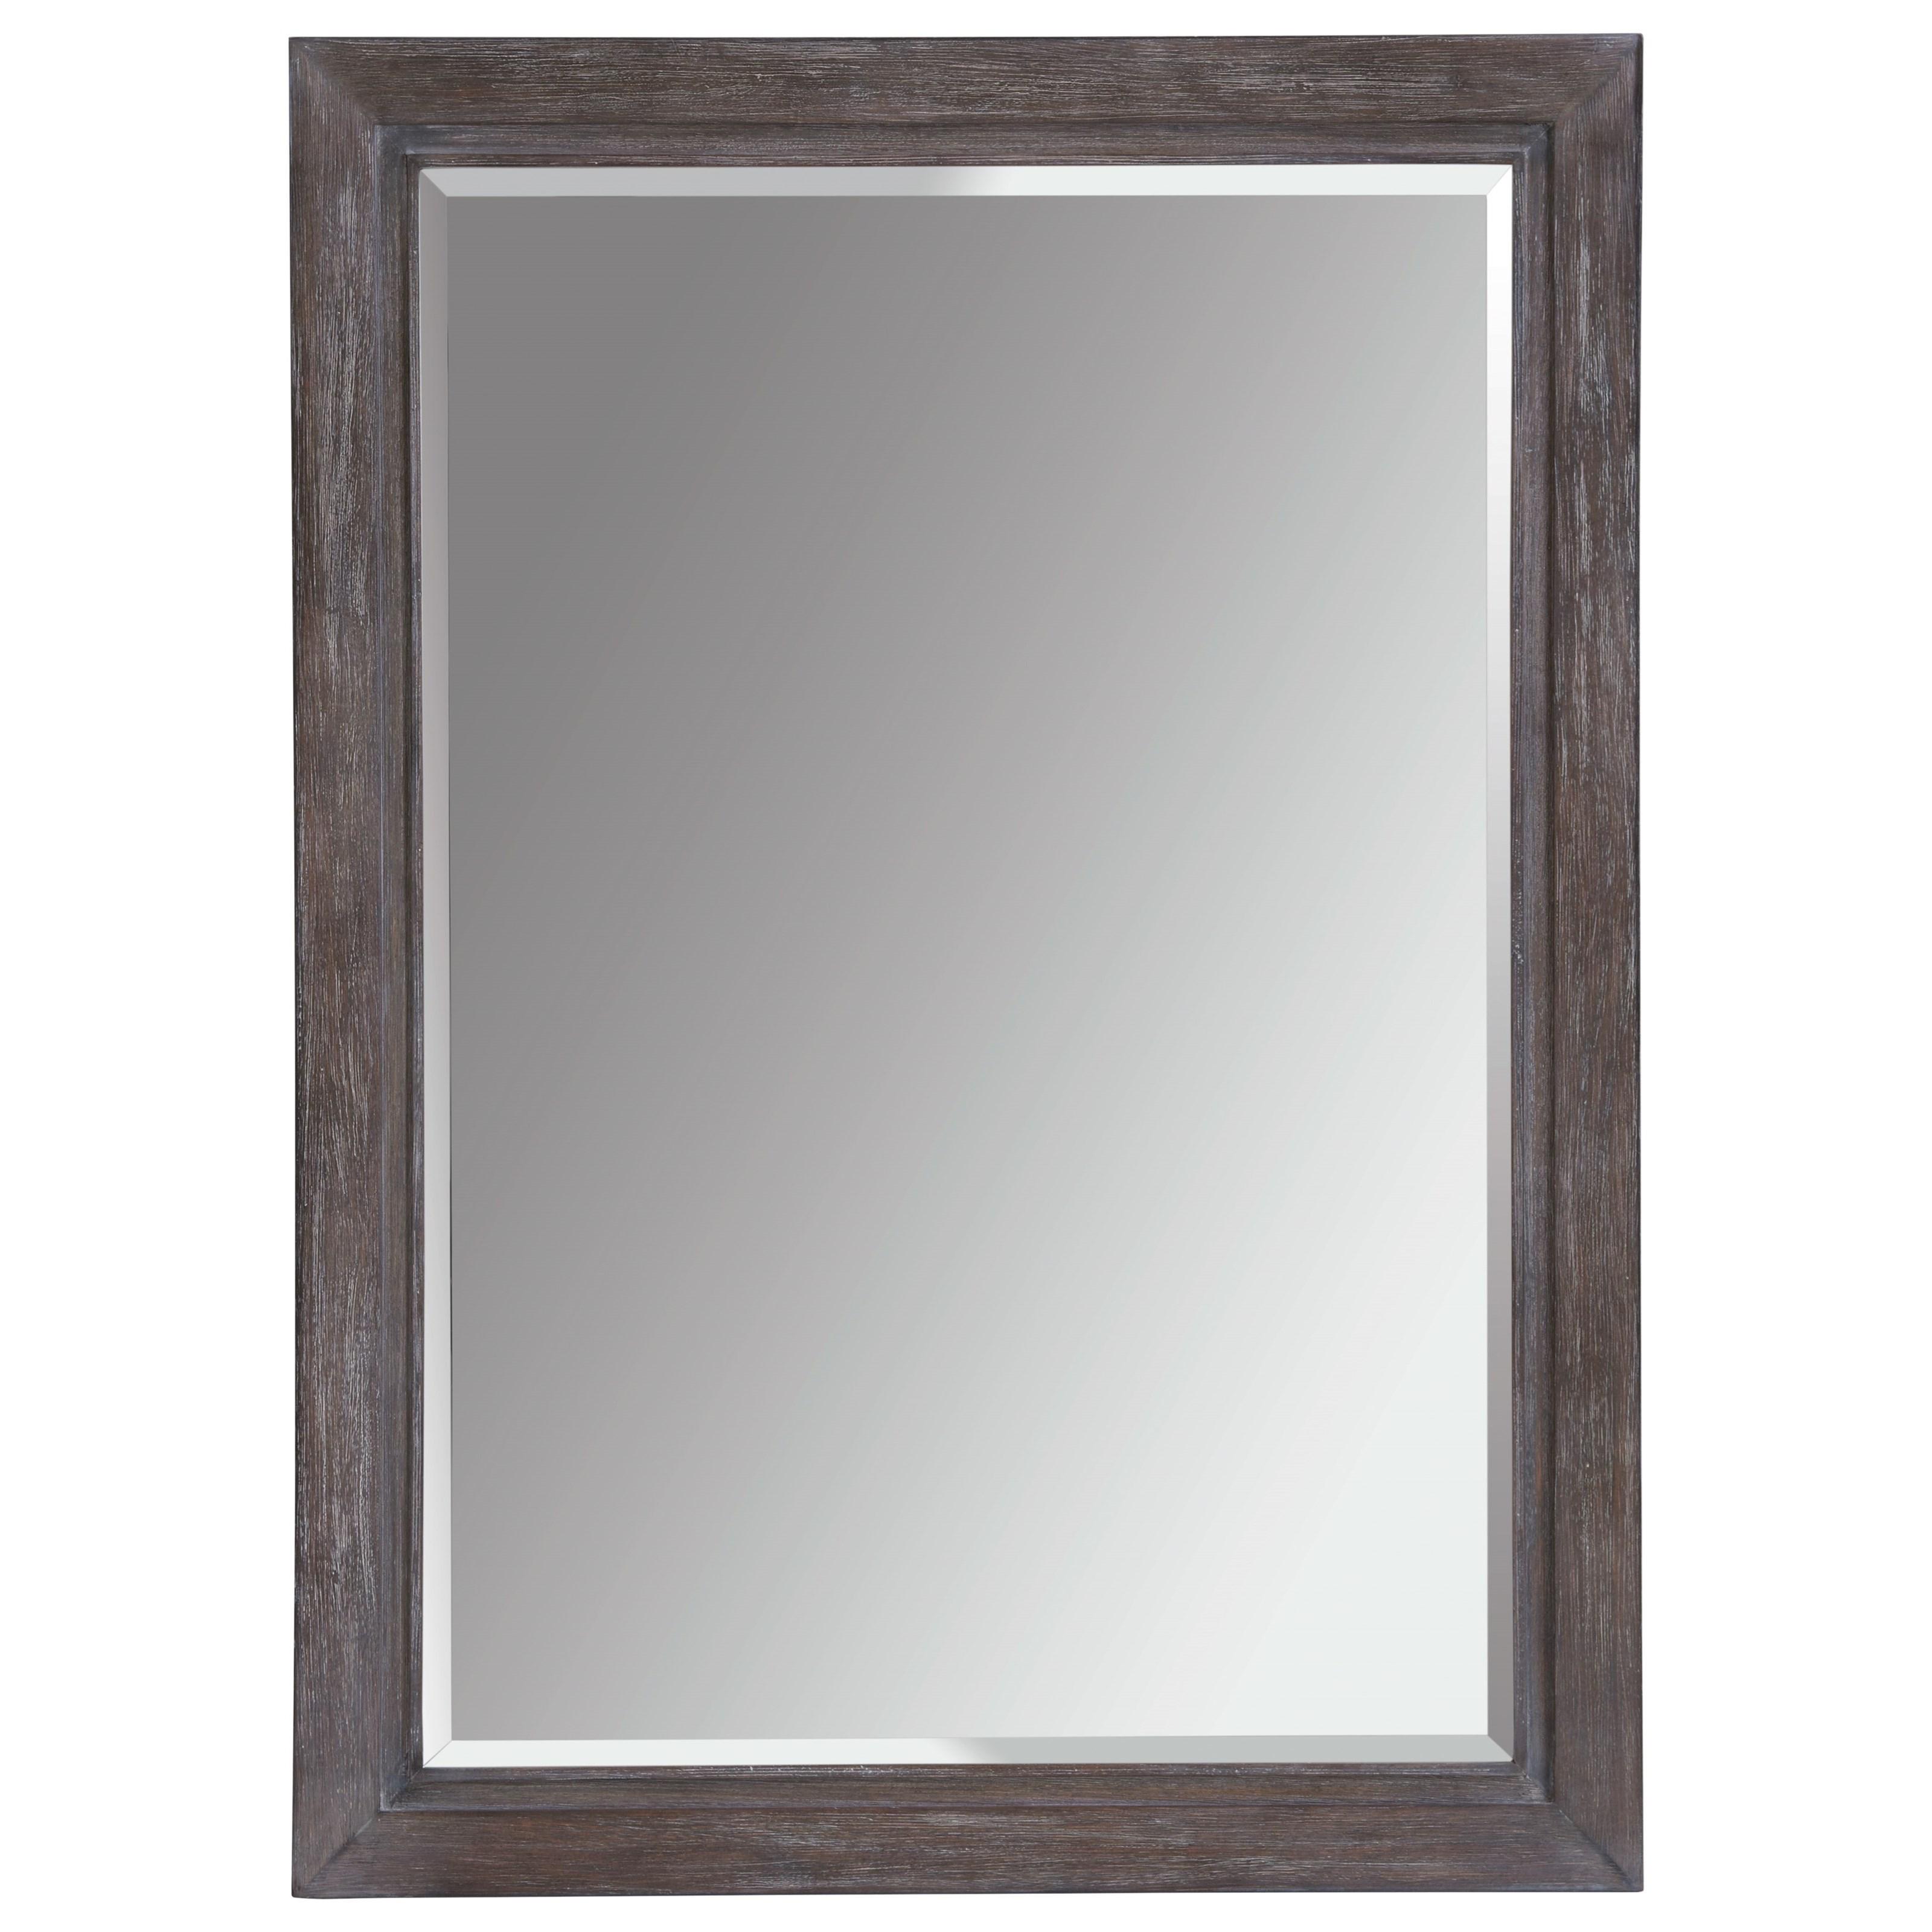 Santana Solana Rectangular Mirror by Lexington at Baer's Furniture